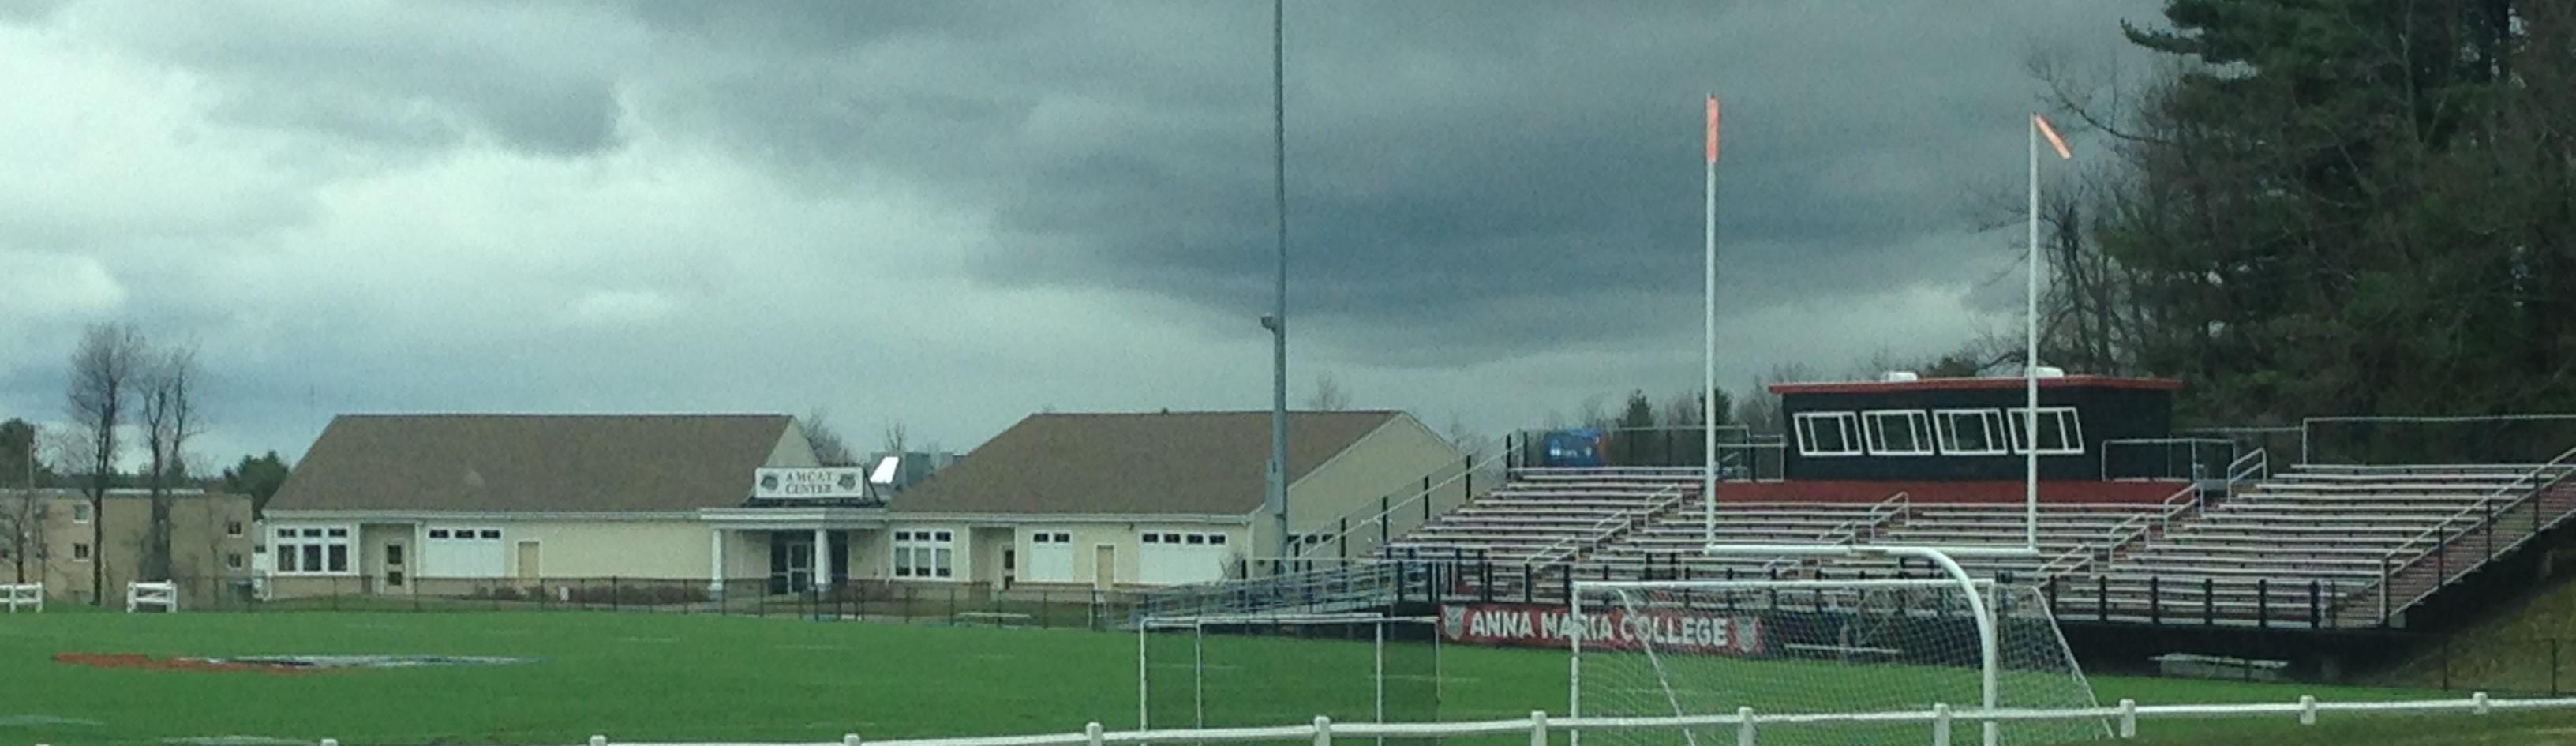 Anna Maria College Football Facilities